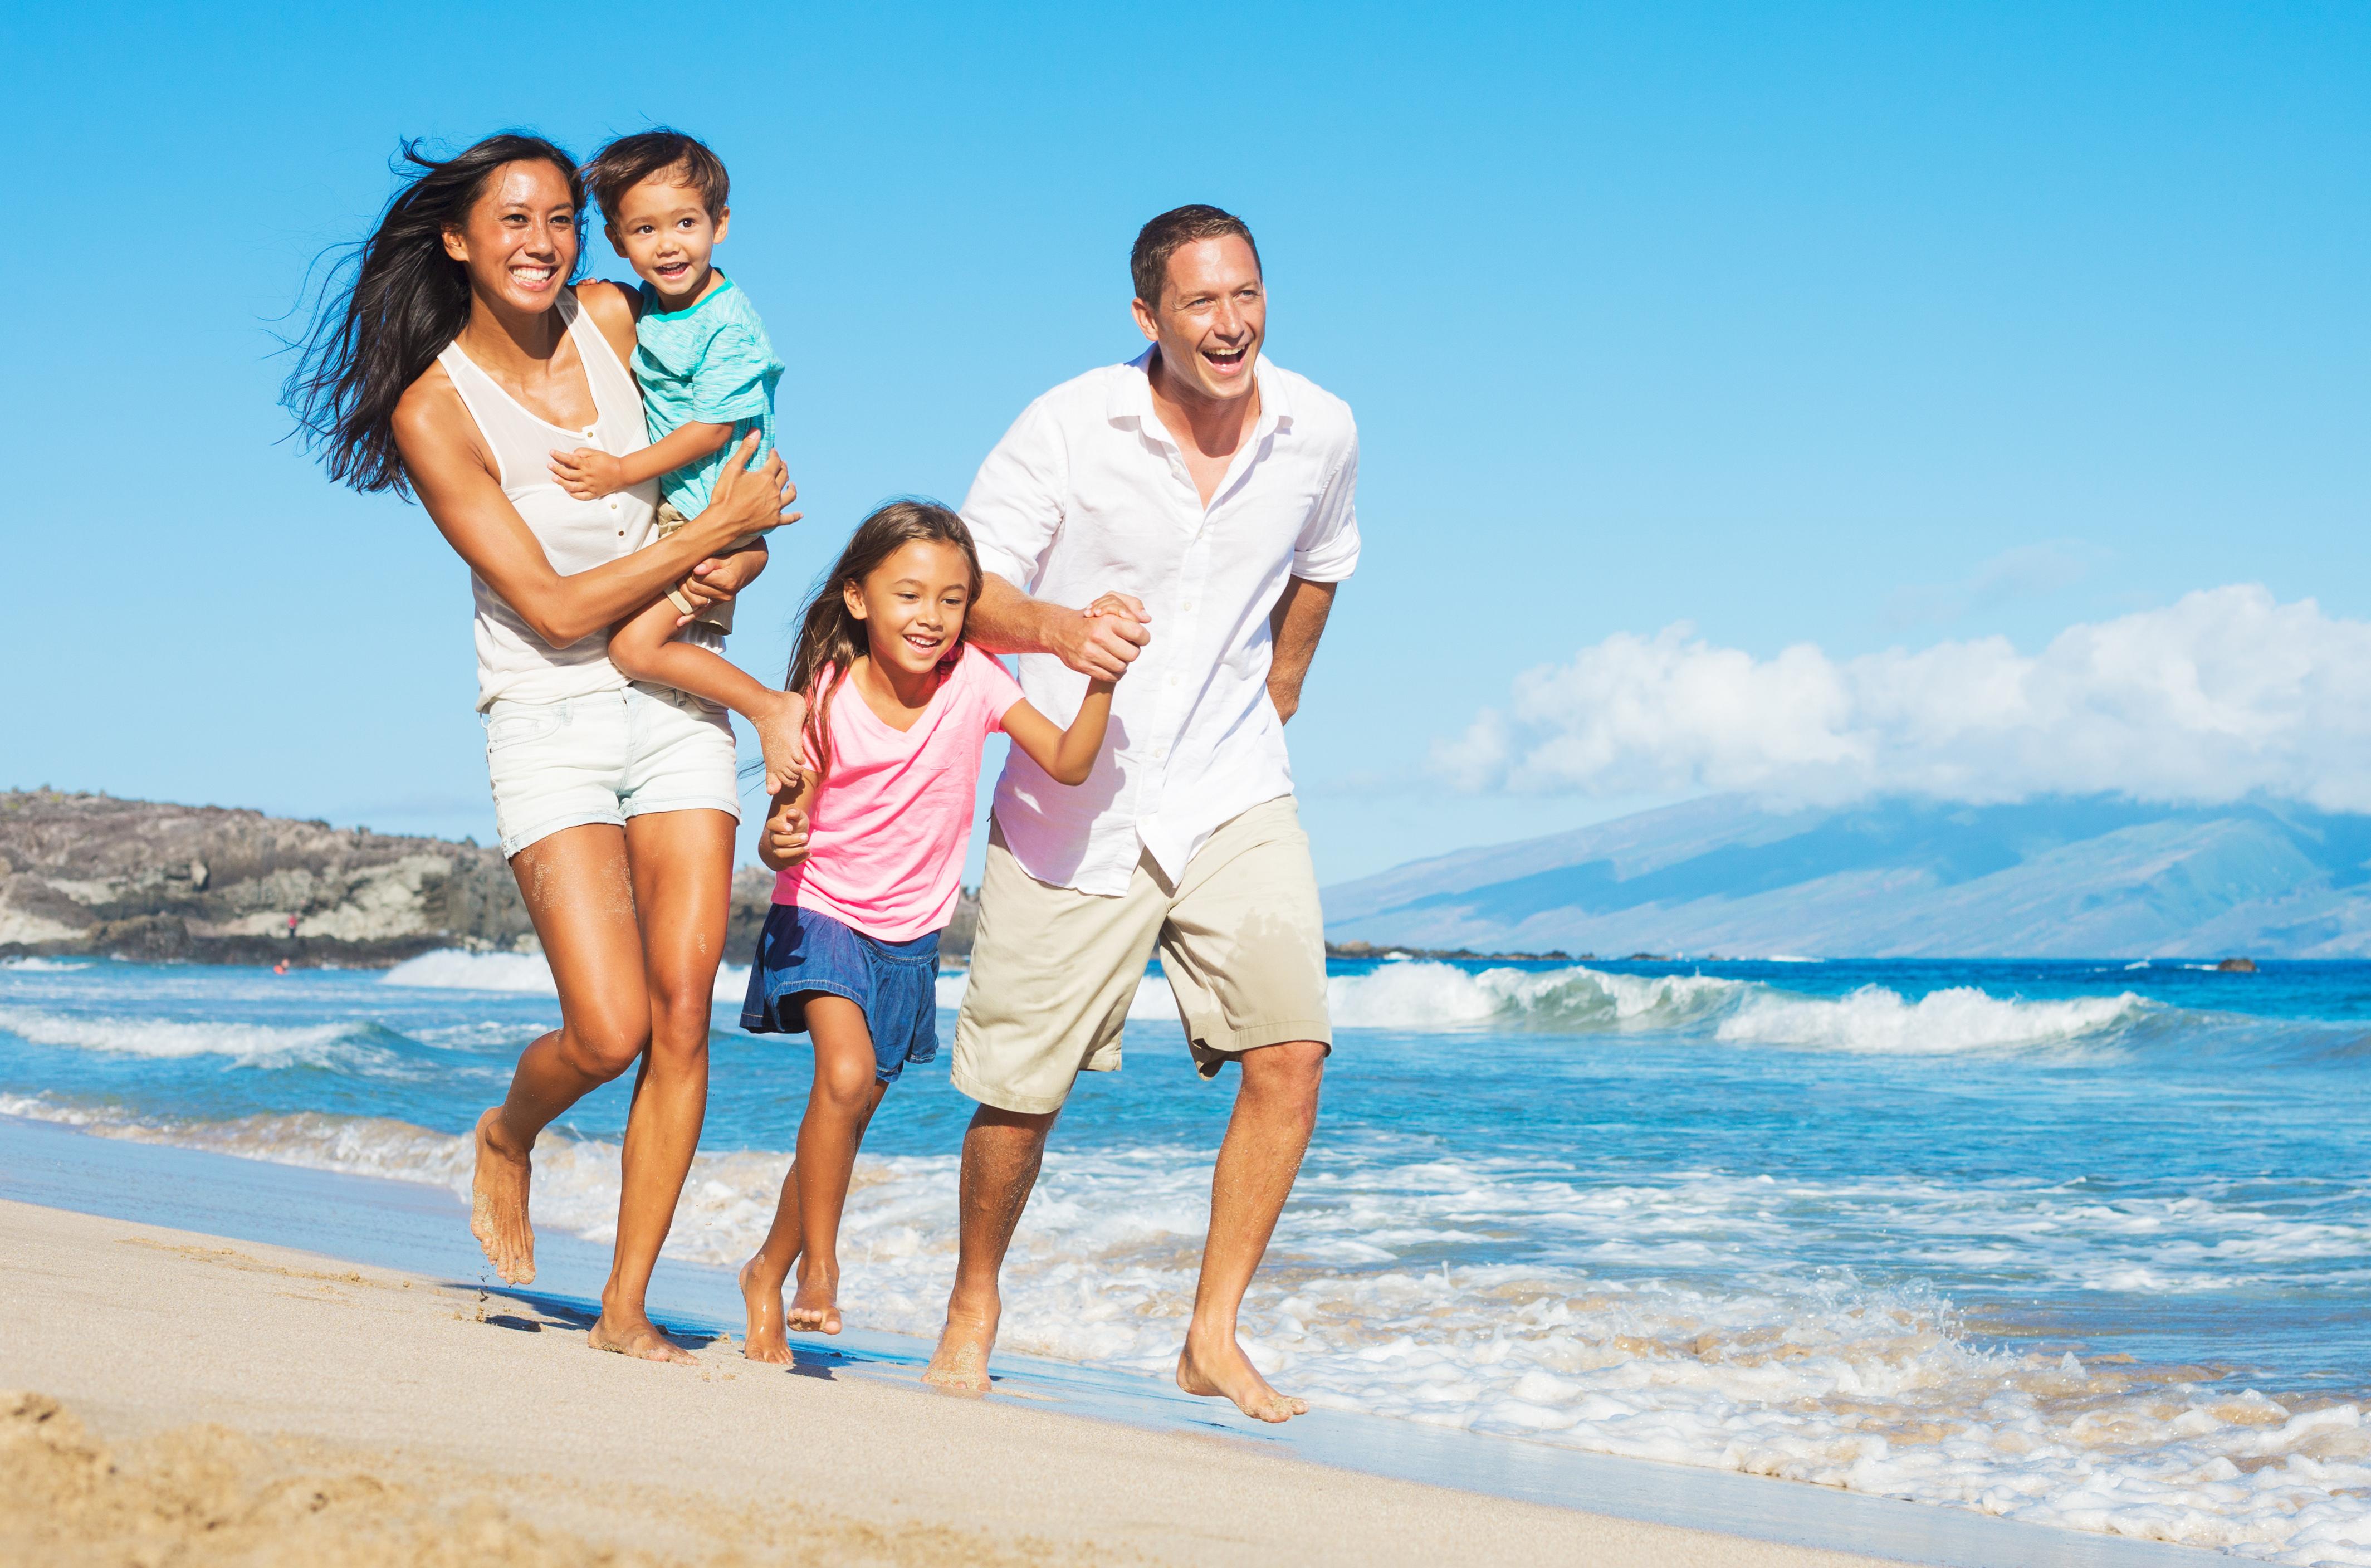 Family beachs nude foto 29